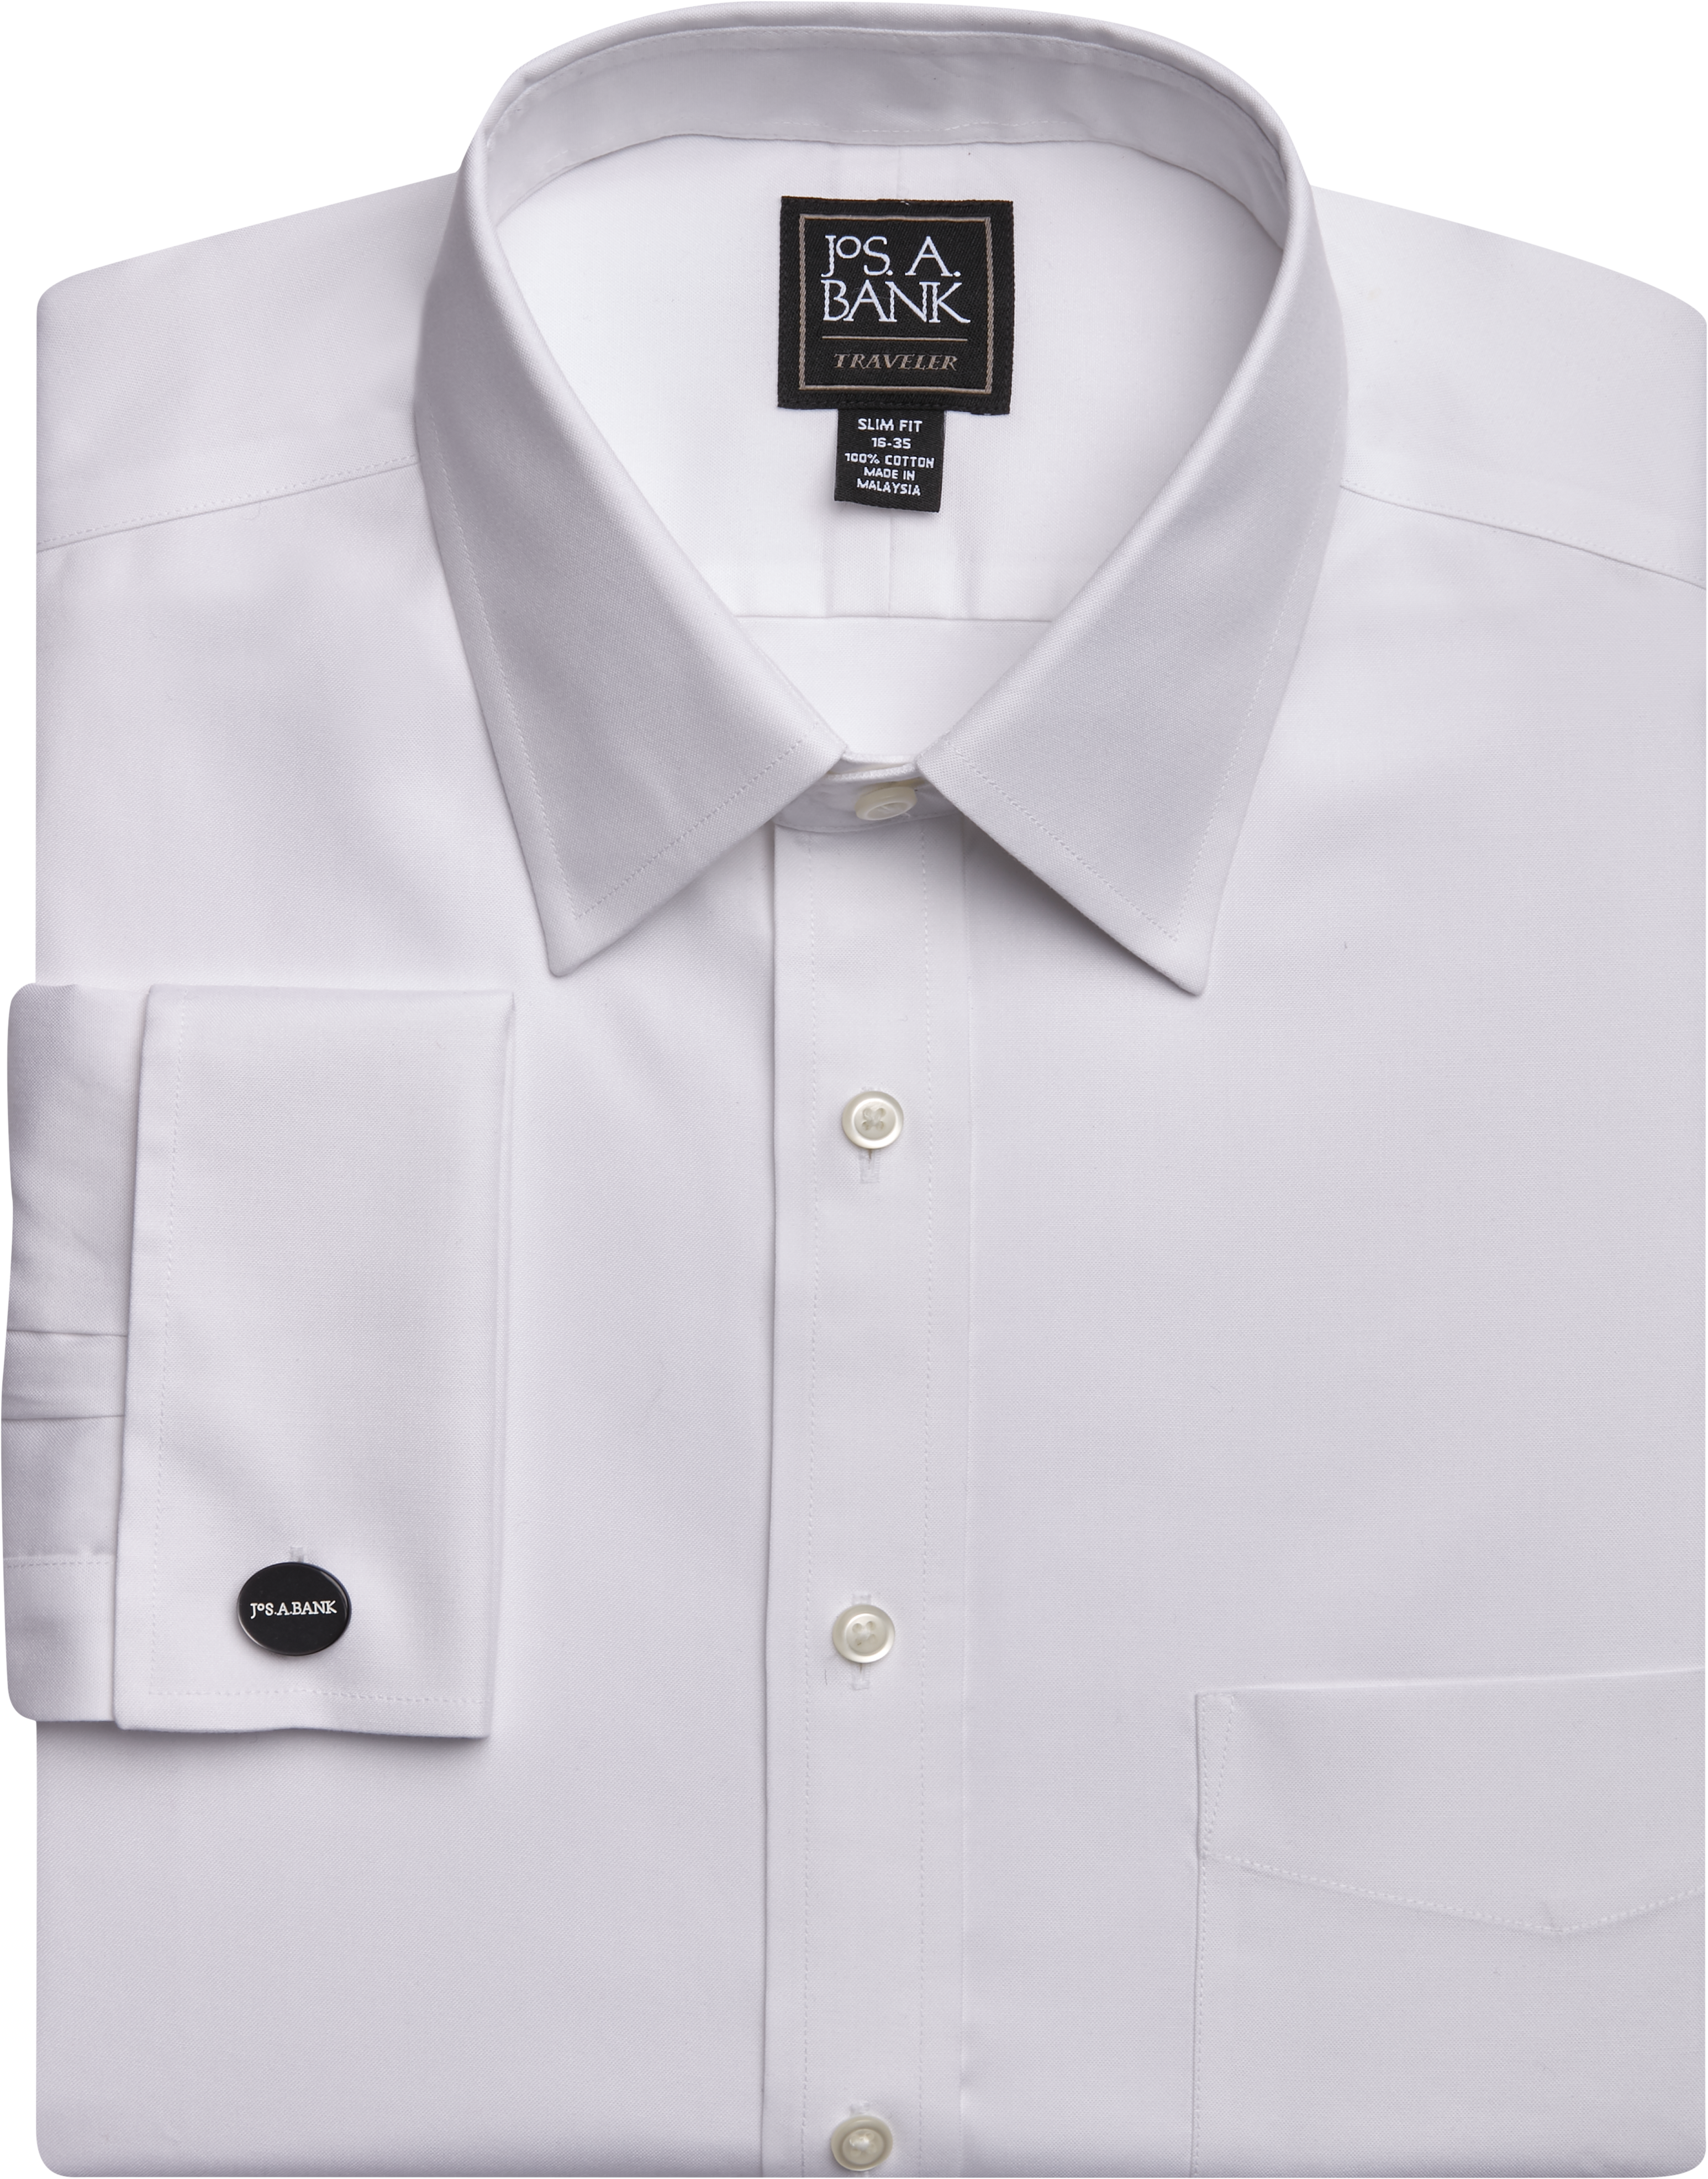 Enro Slim Boys Cotton Non-Iron French Cuff Shirt